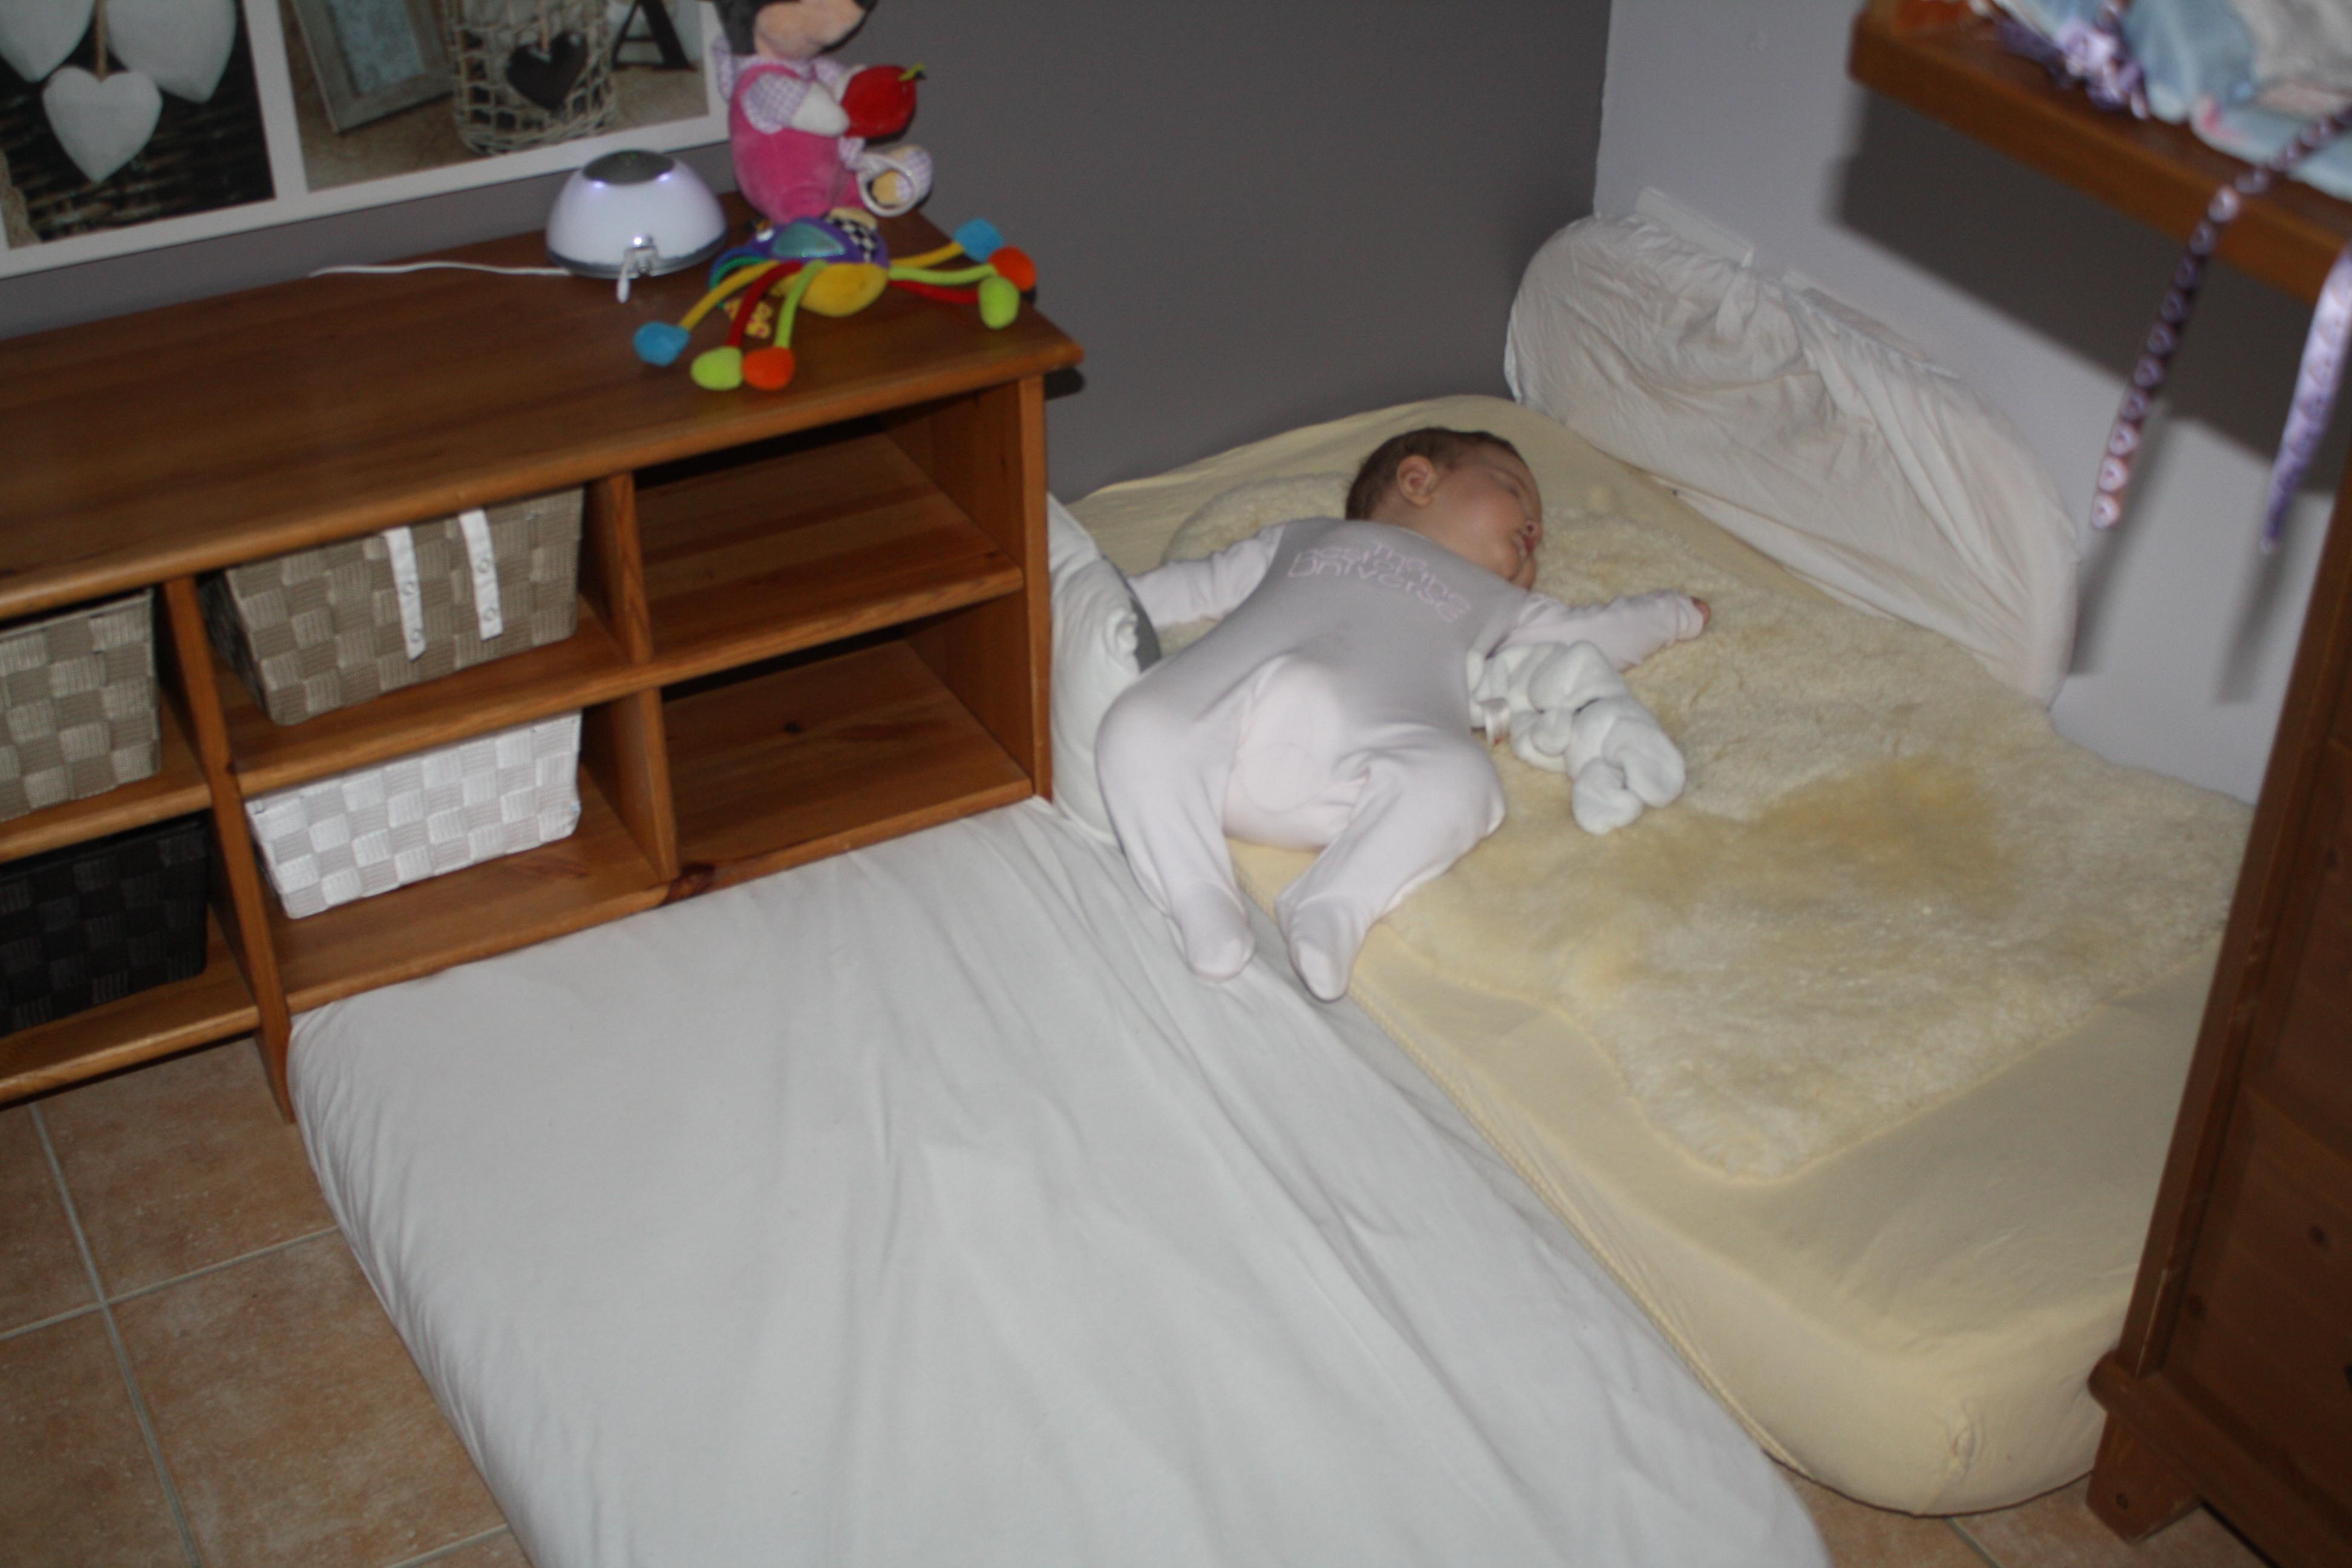 dormir par terre sur un matelas dormir sur matelas au sol dormir sur matelas au sol ma fille. Black Bedroom Furniture Sets. Home Design Ideas